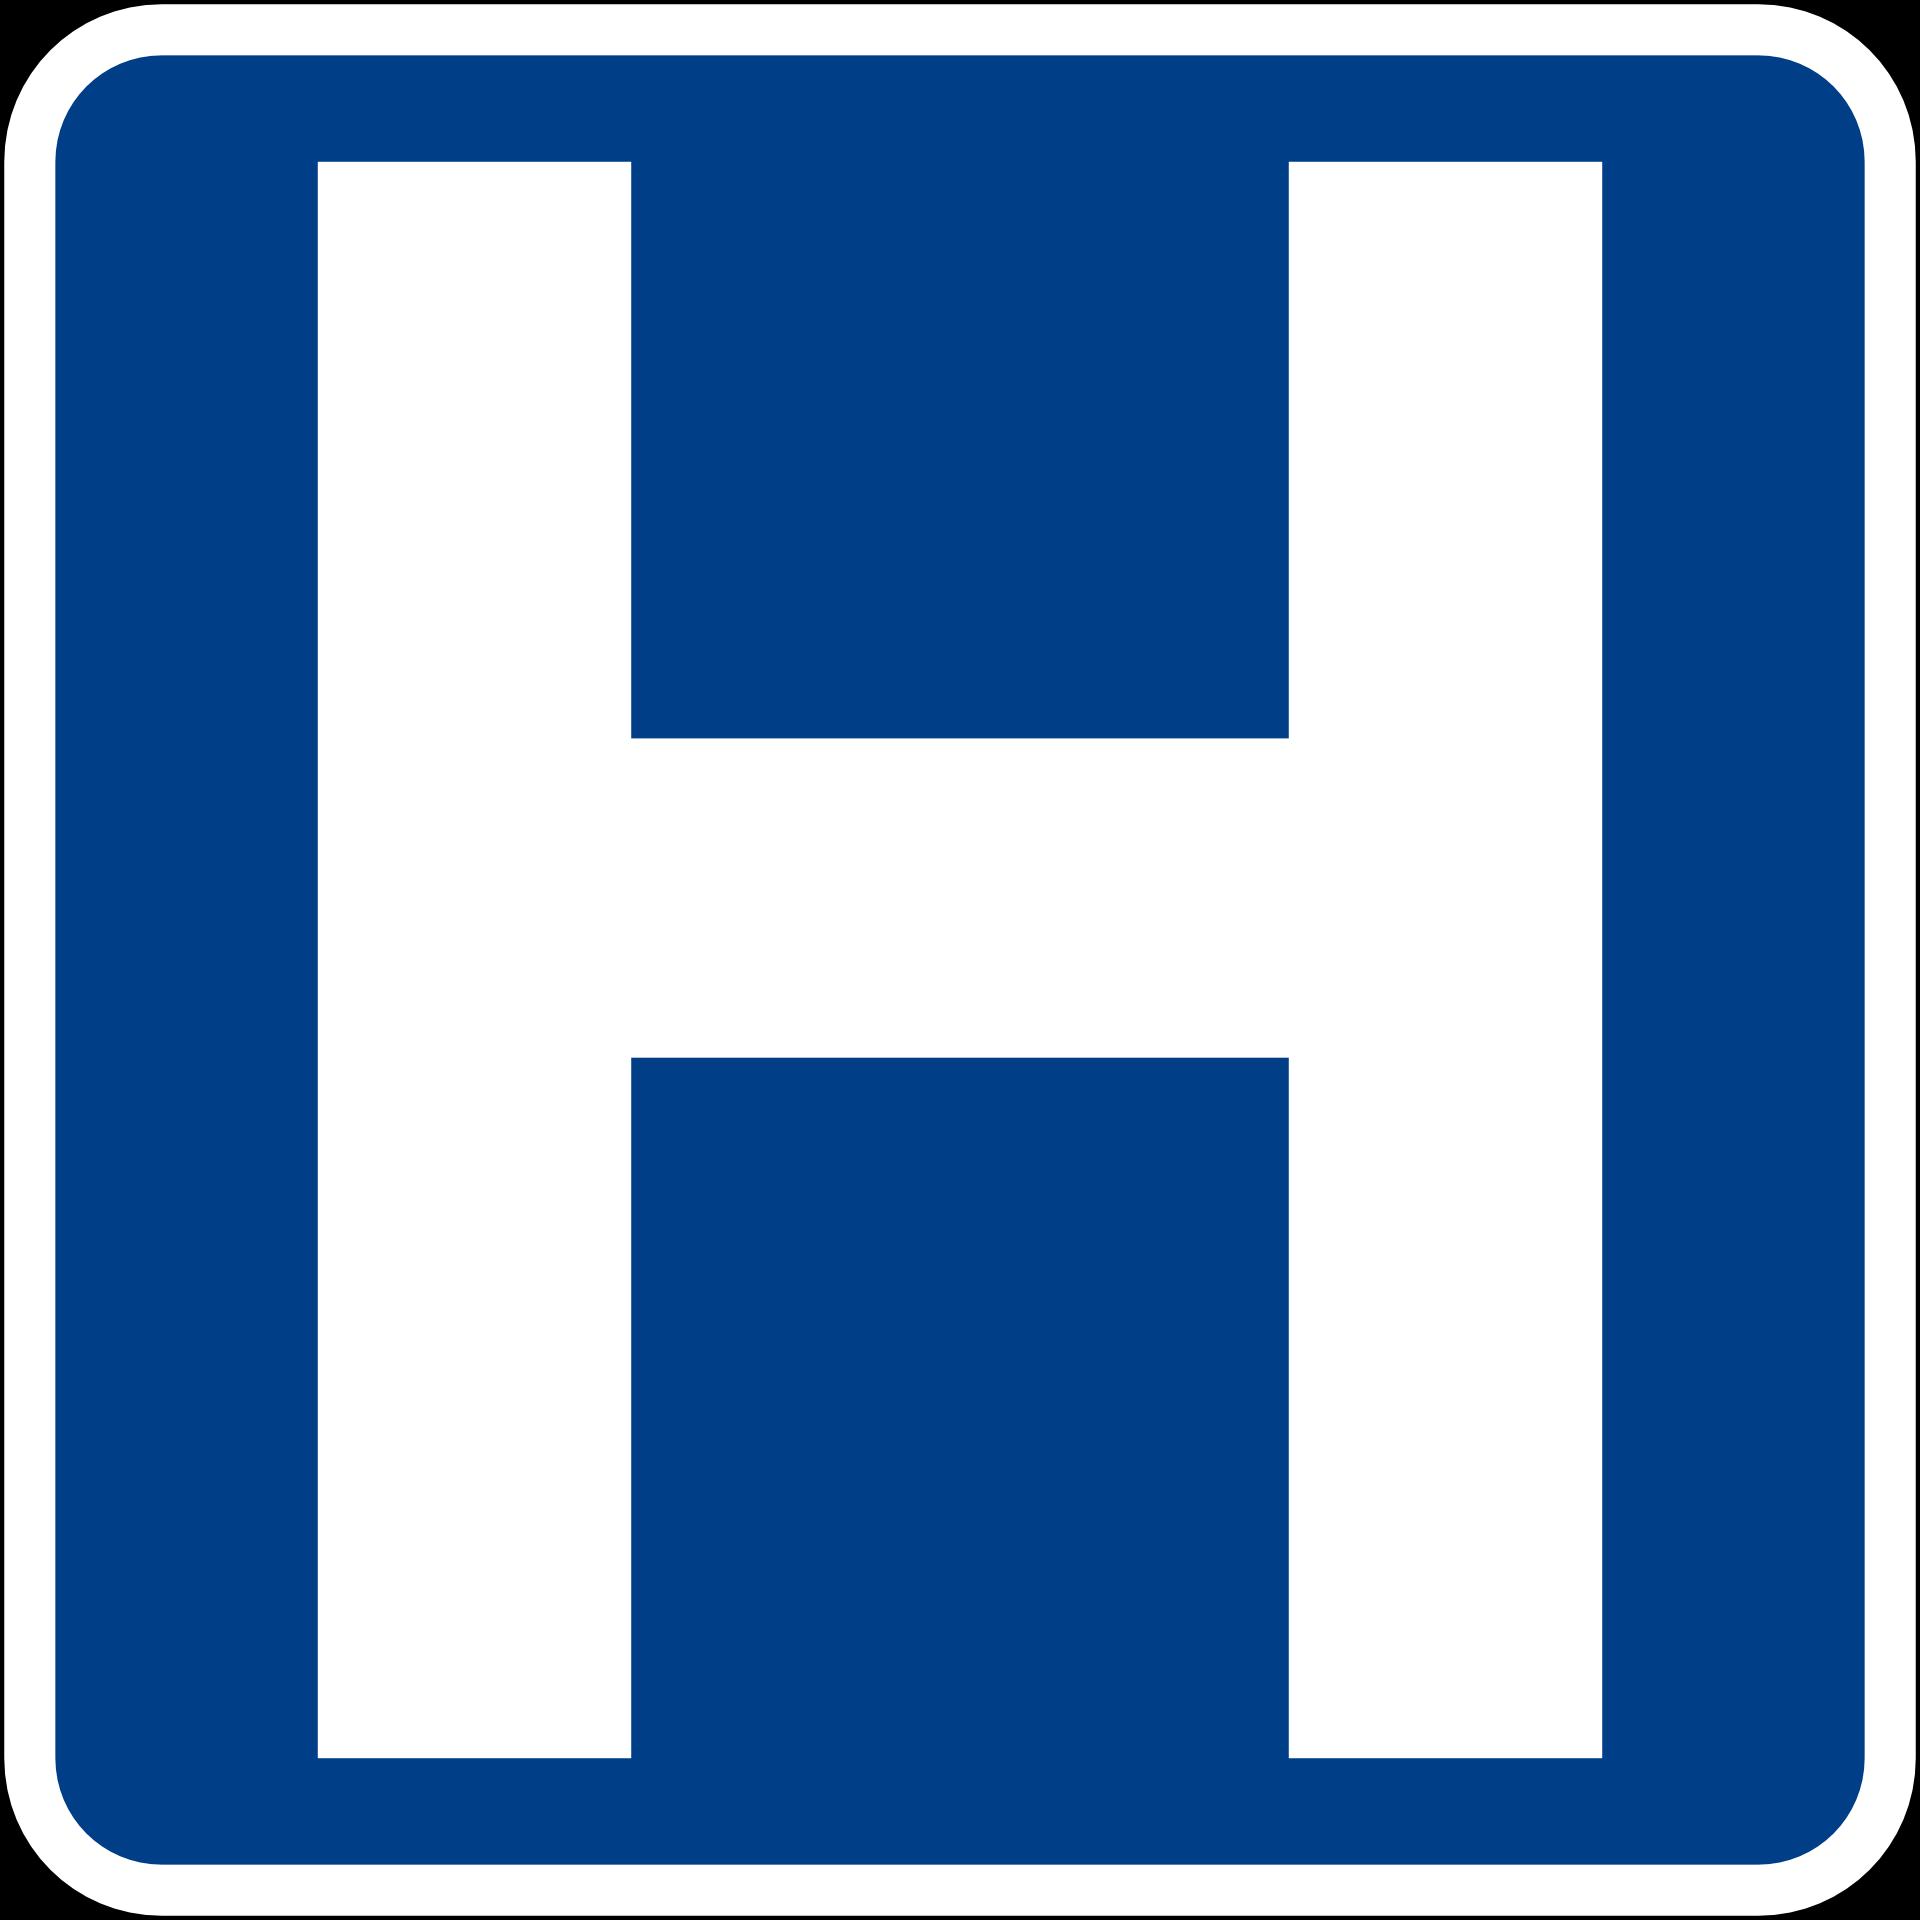 square blue sign saying Hospital